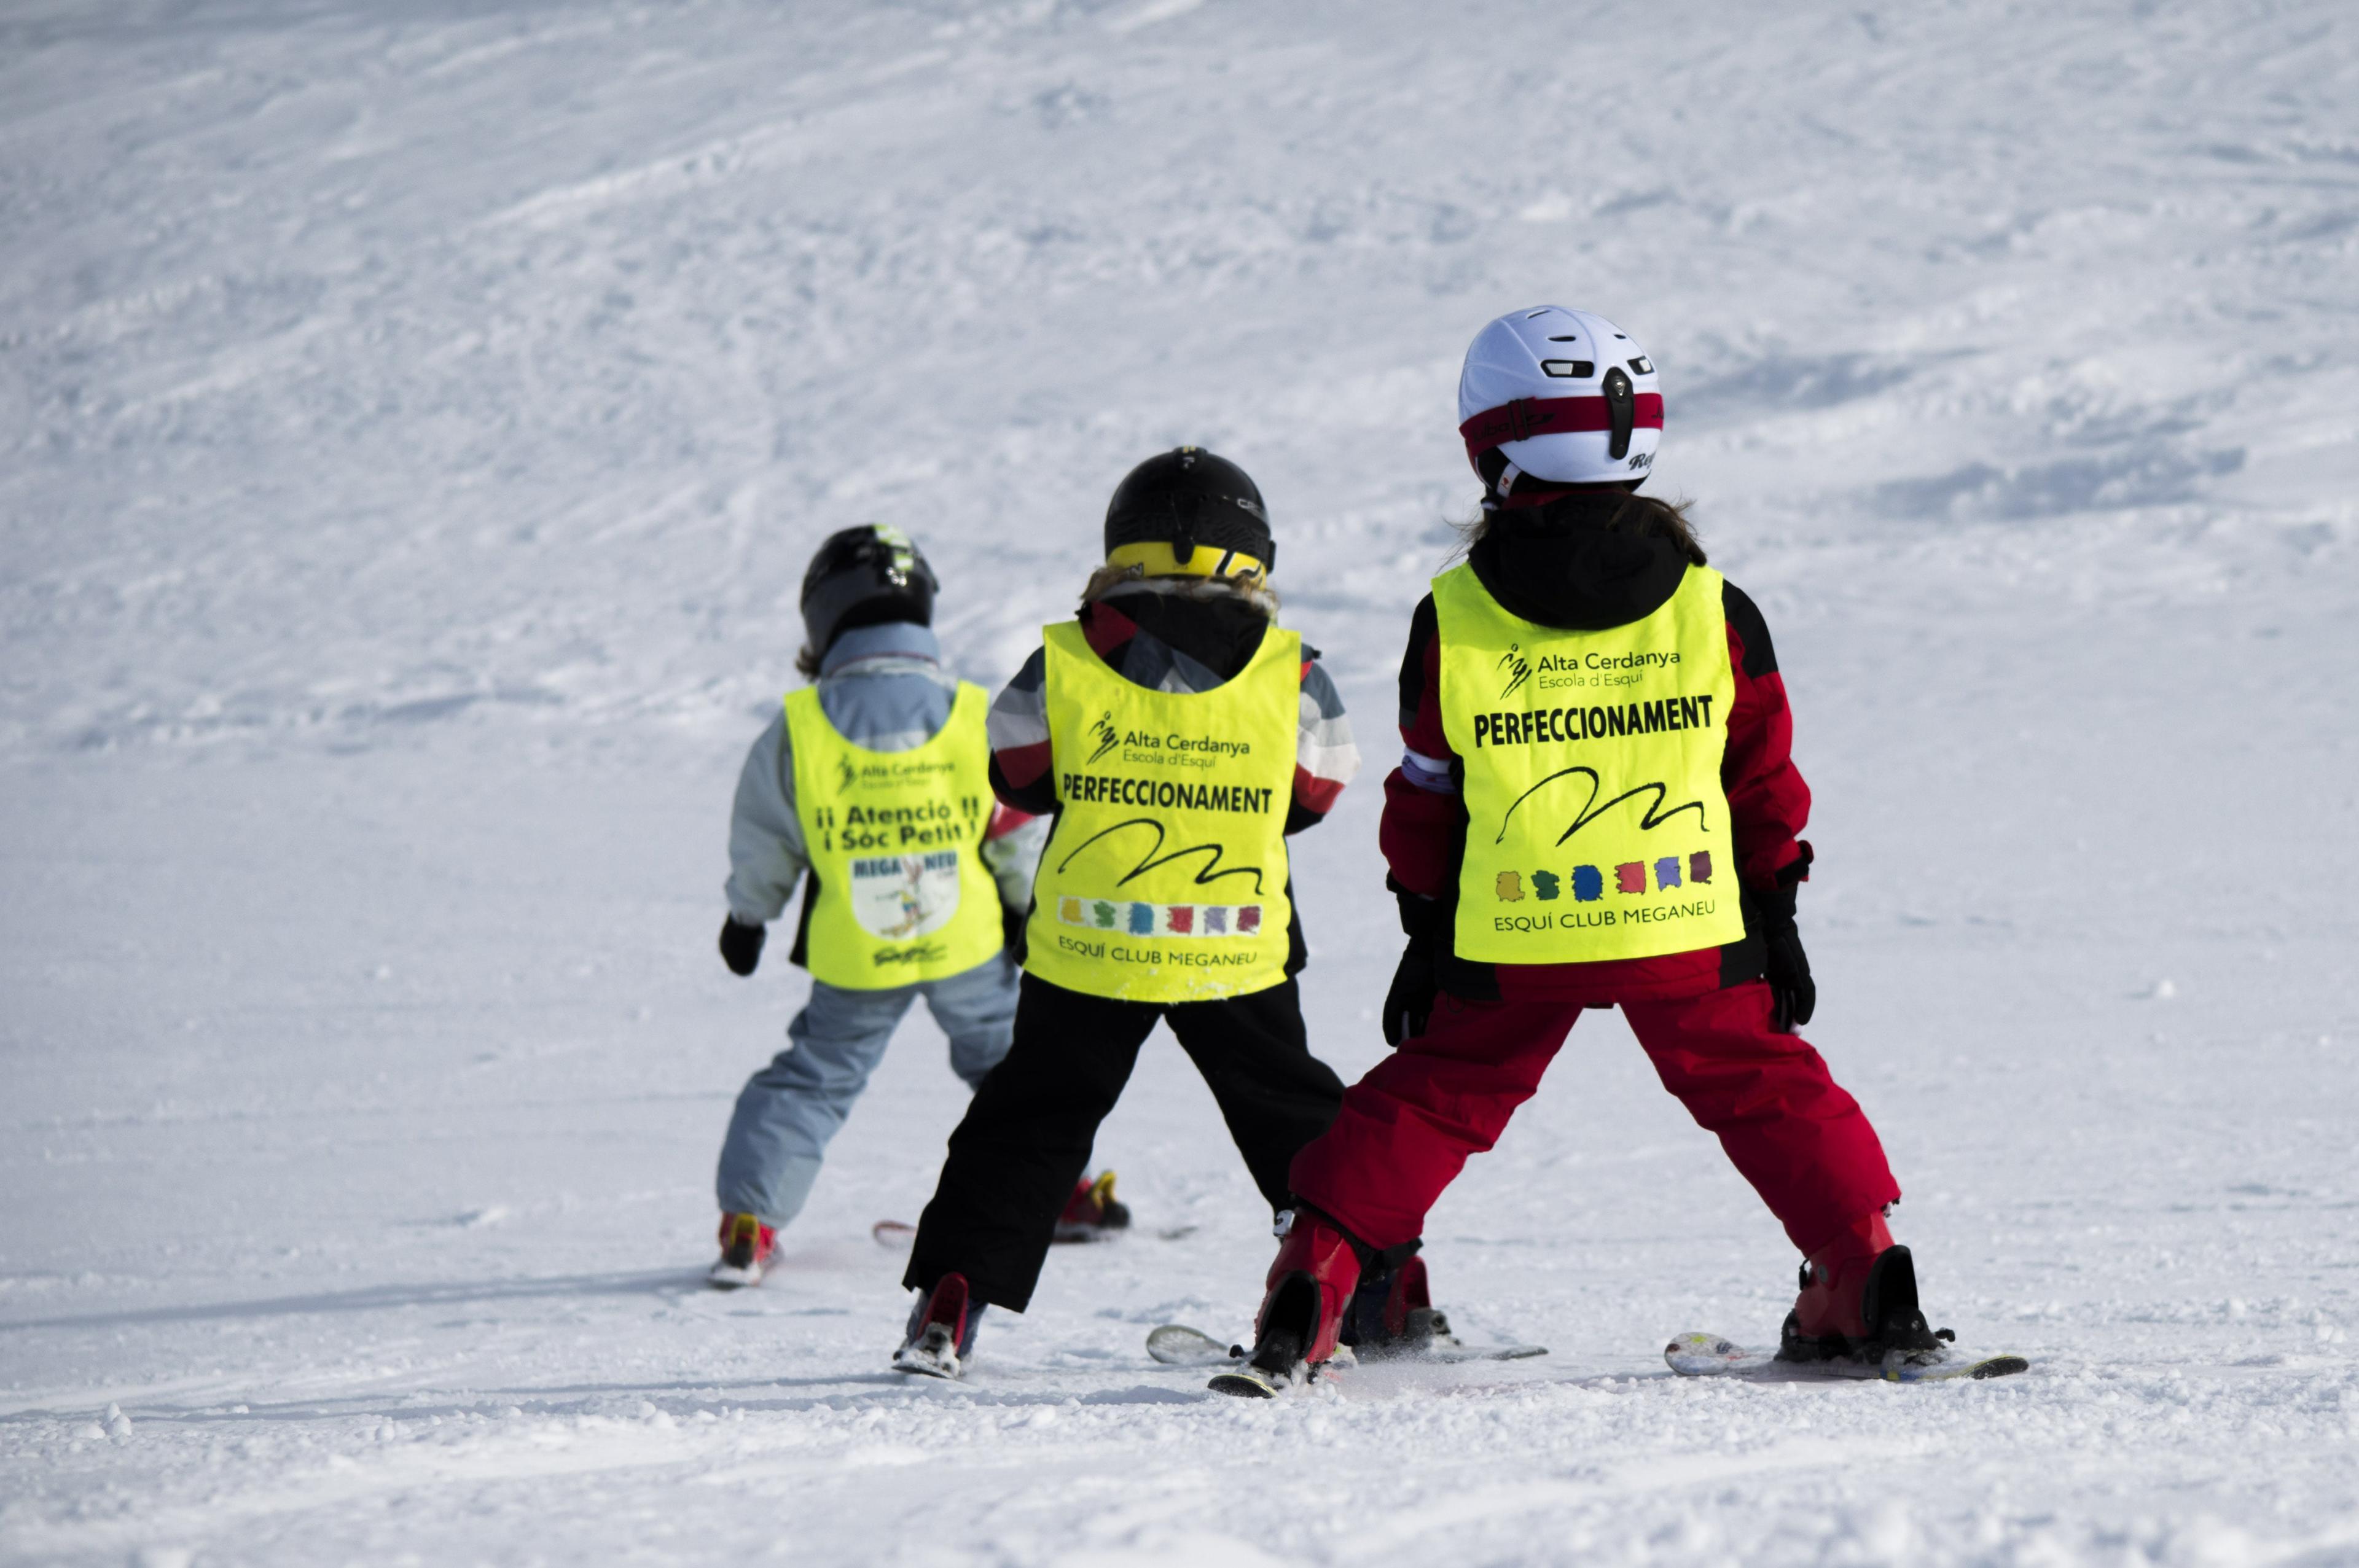 Clases de esquí (4-6 años) para Principiantes- Fin de semana